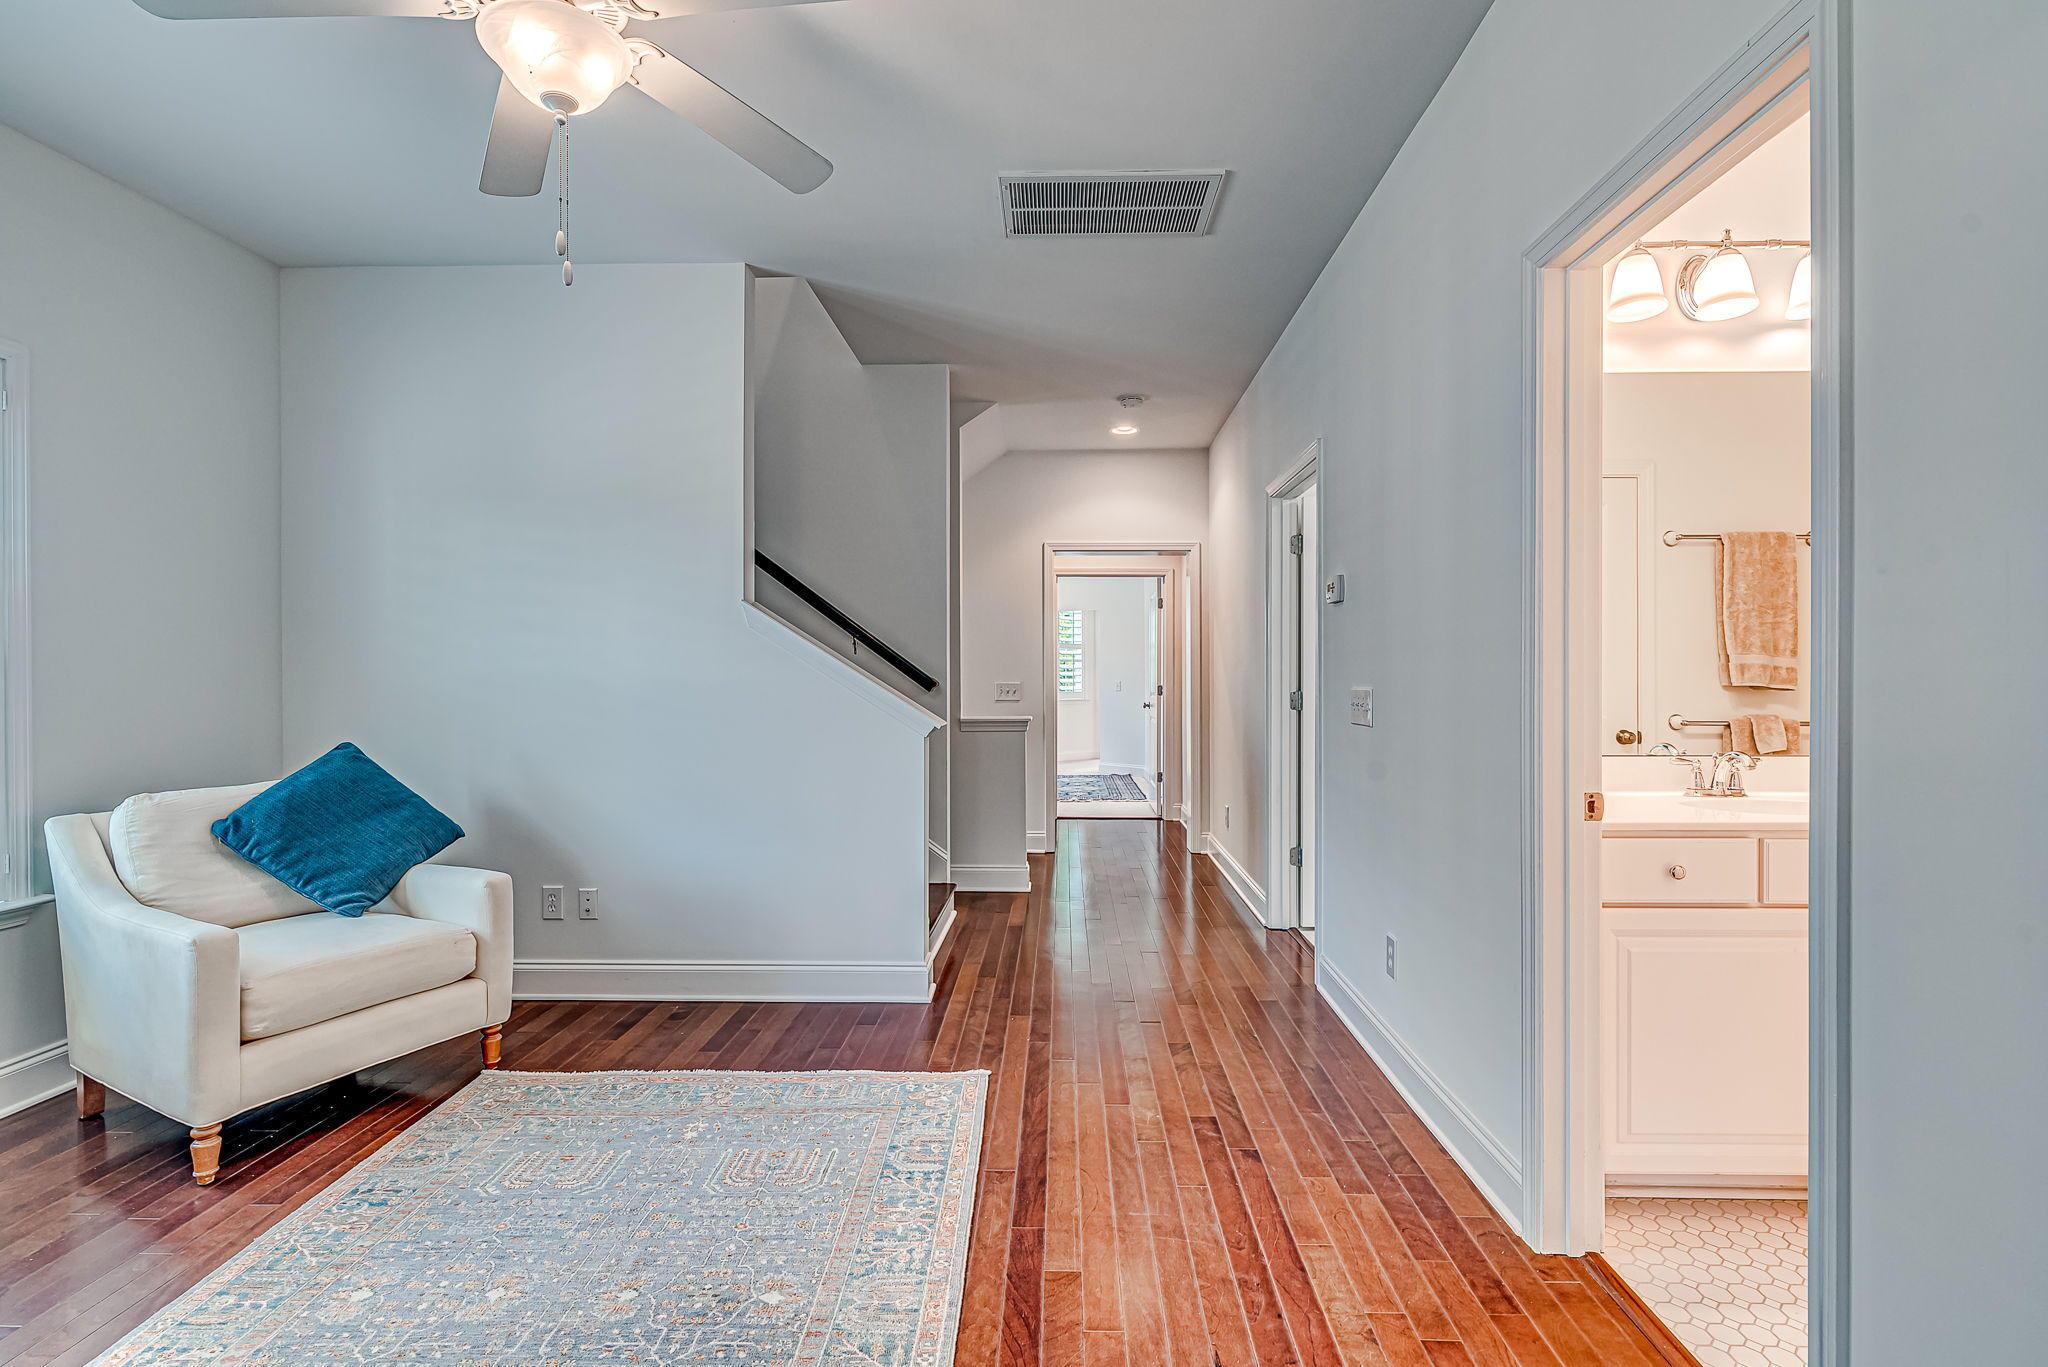 Dunes West Homes For Sale - 2476 Kings Gate, Mount Pleasant, SC - 8